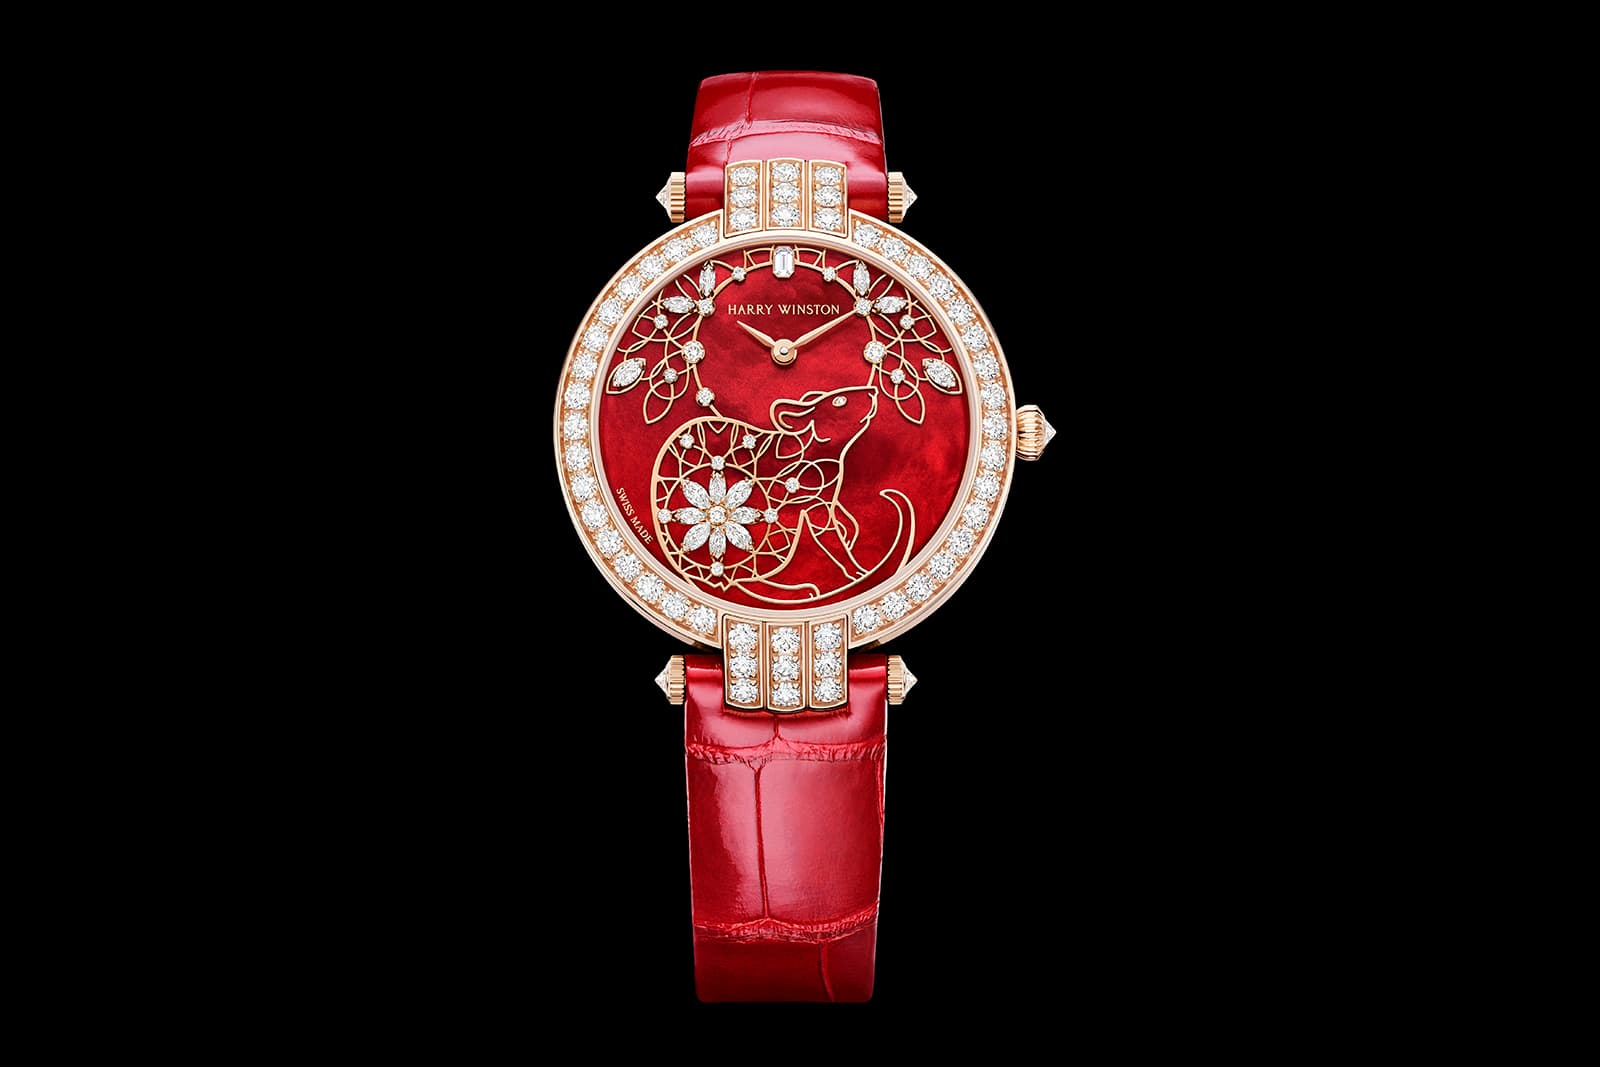 Часы Harry Winston Premier Chinese New Year Automatic 36mm из розового золота с перламутром и 109 бриллиантами общим весом 2.91ct